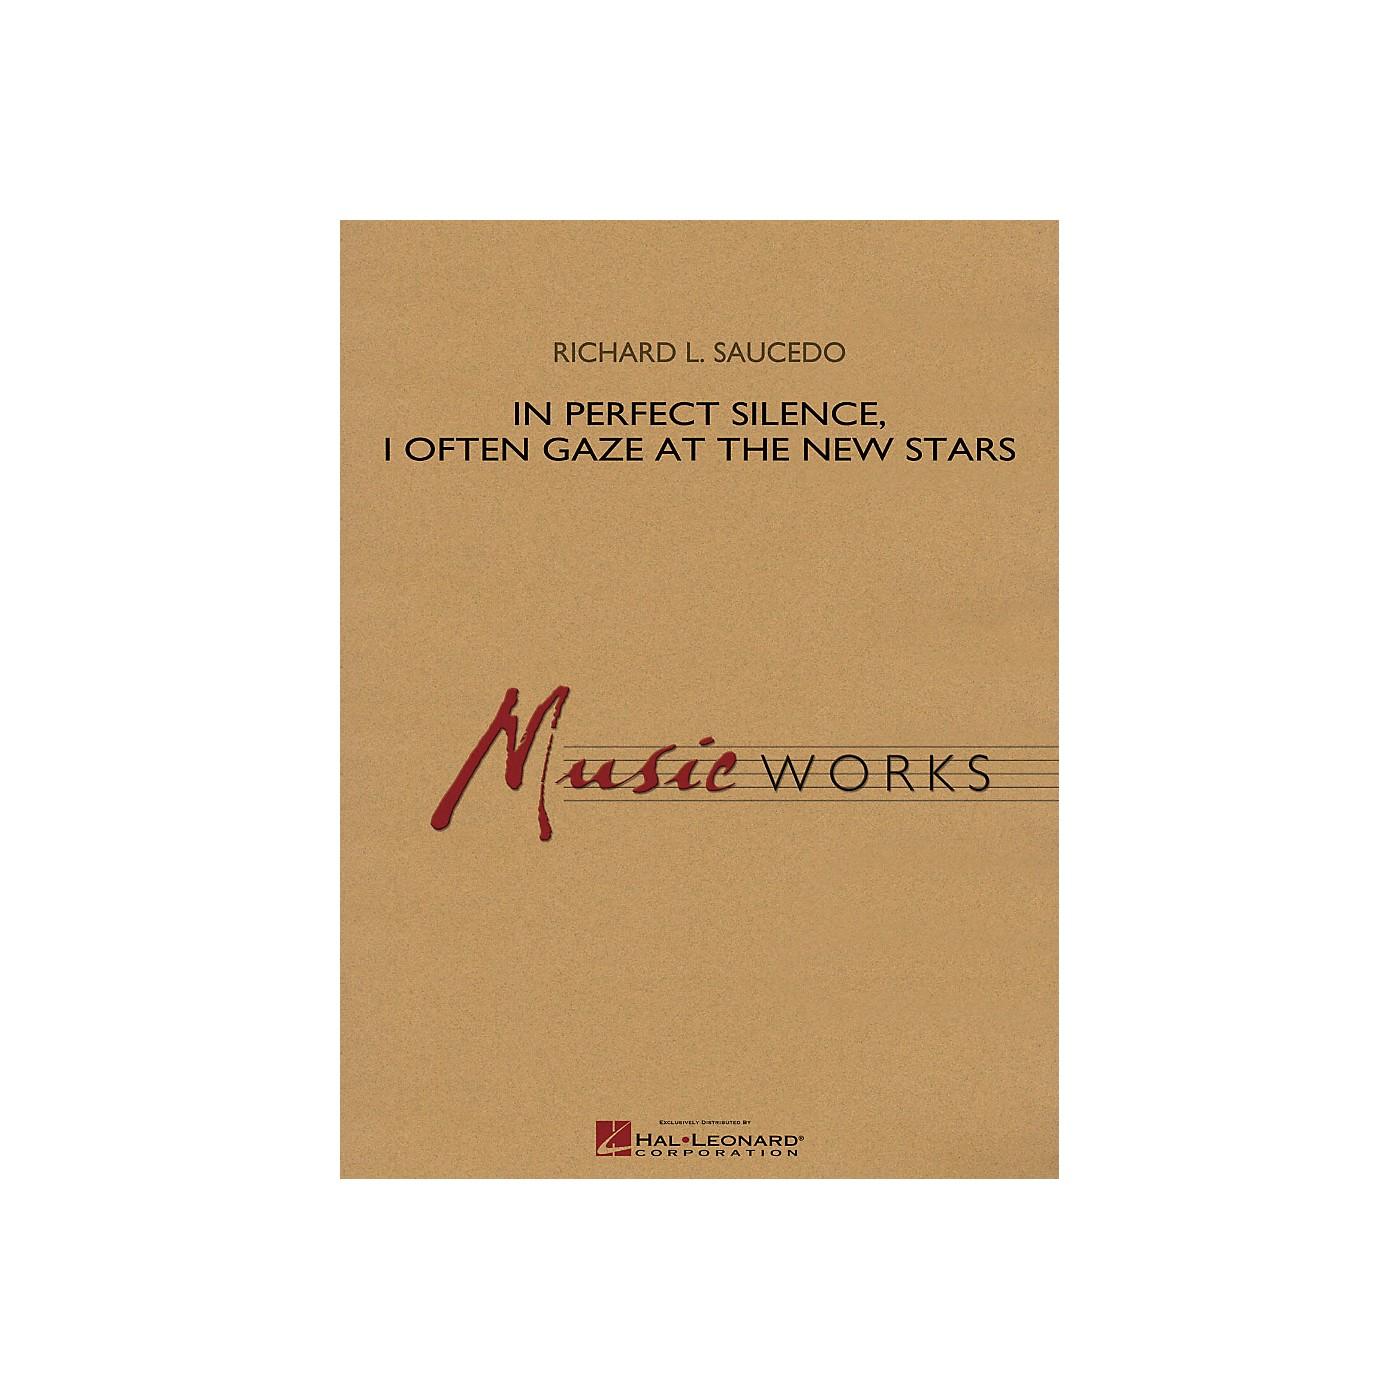 Hal Leonard In Perfect Silence, I Often Gaze At The New Stars - Music Works Series Grade 4 thumbnail